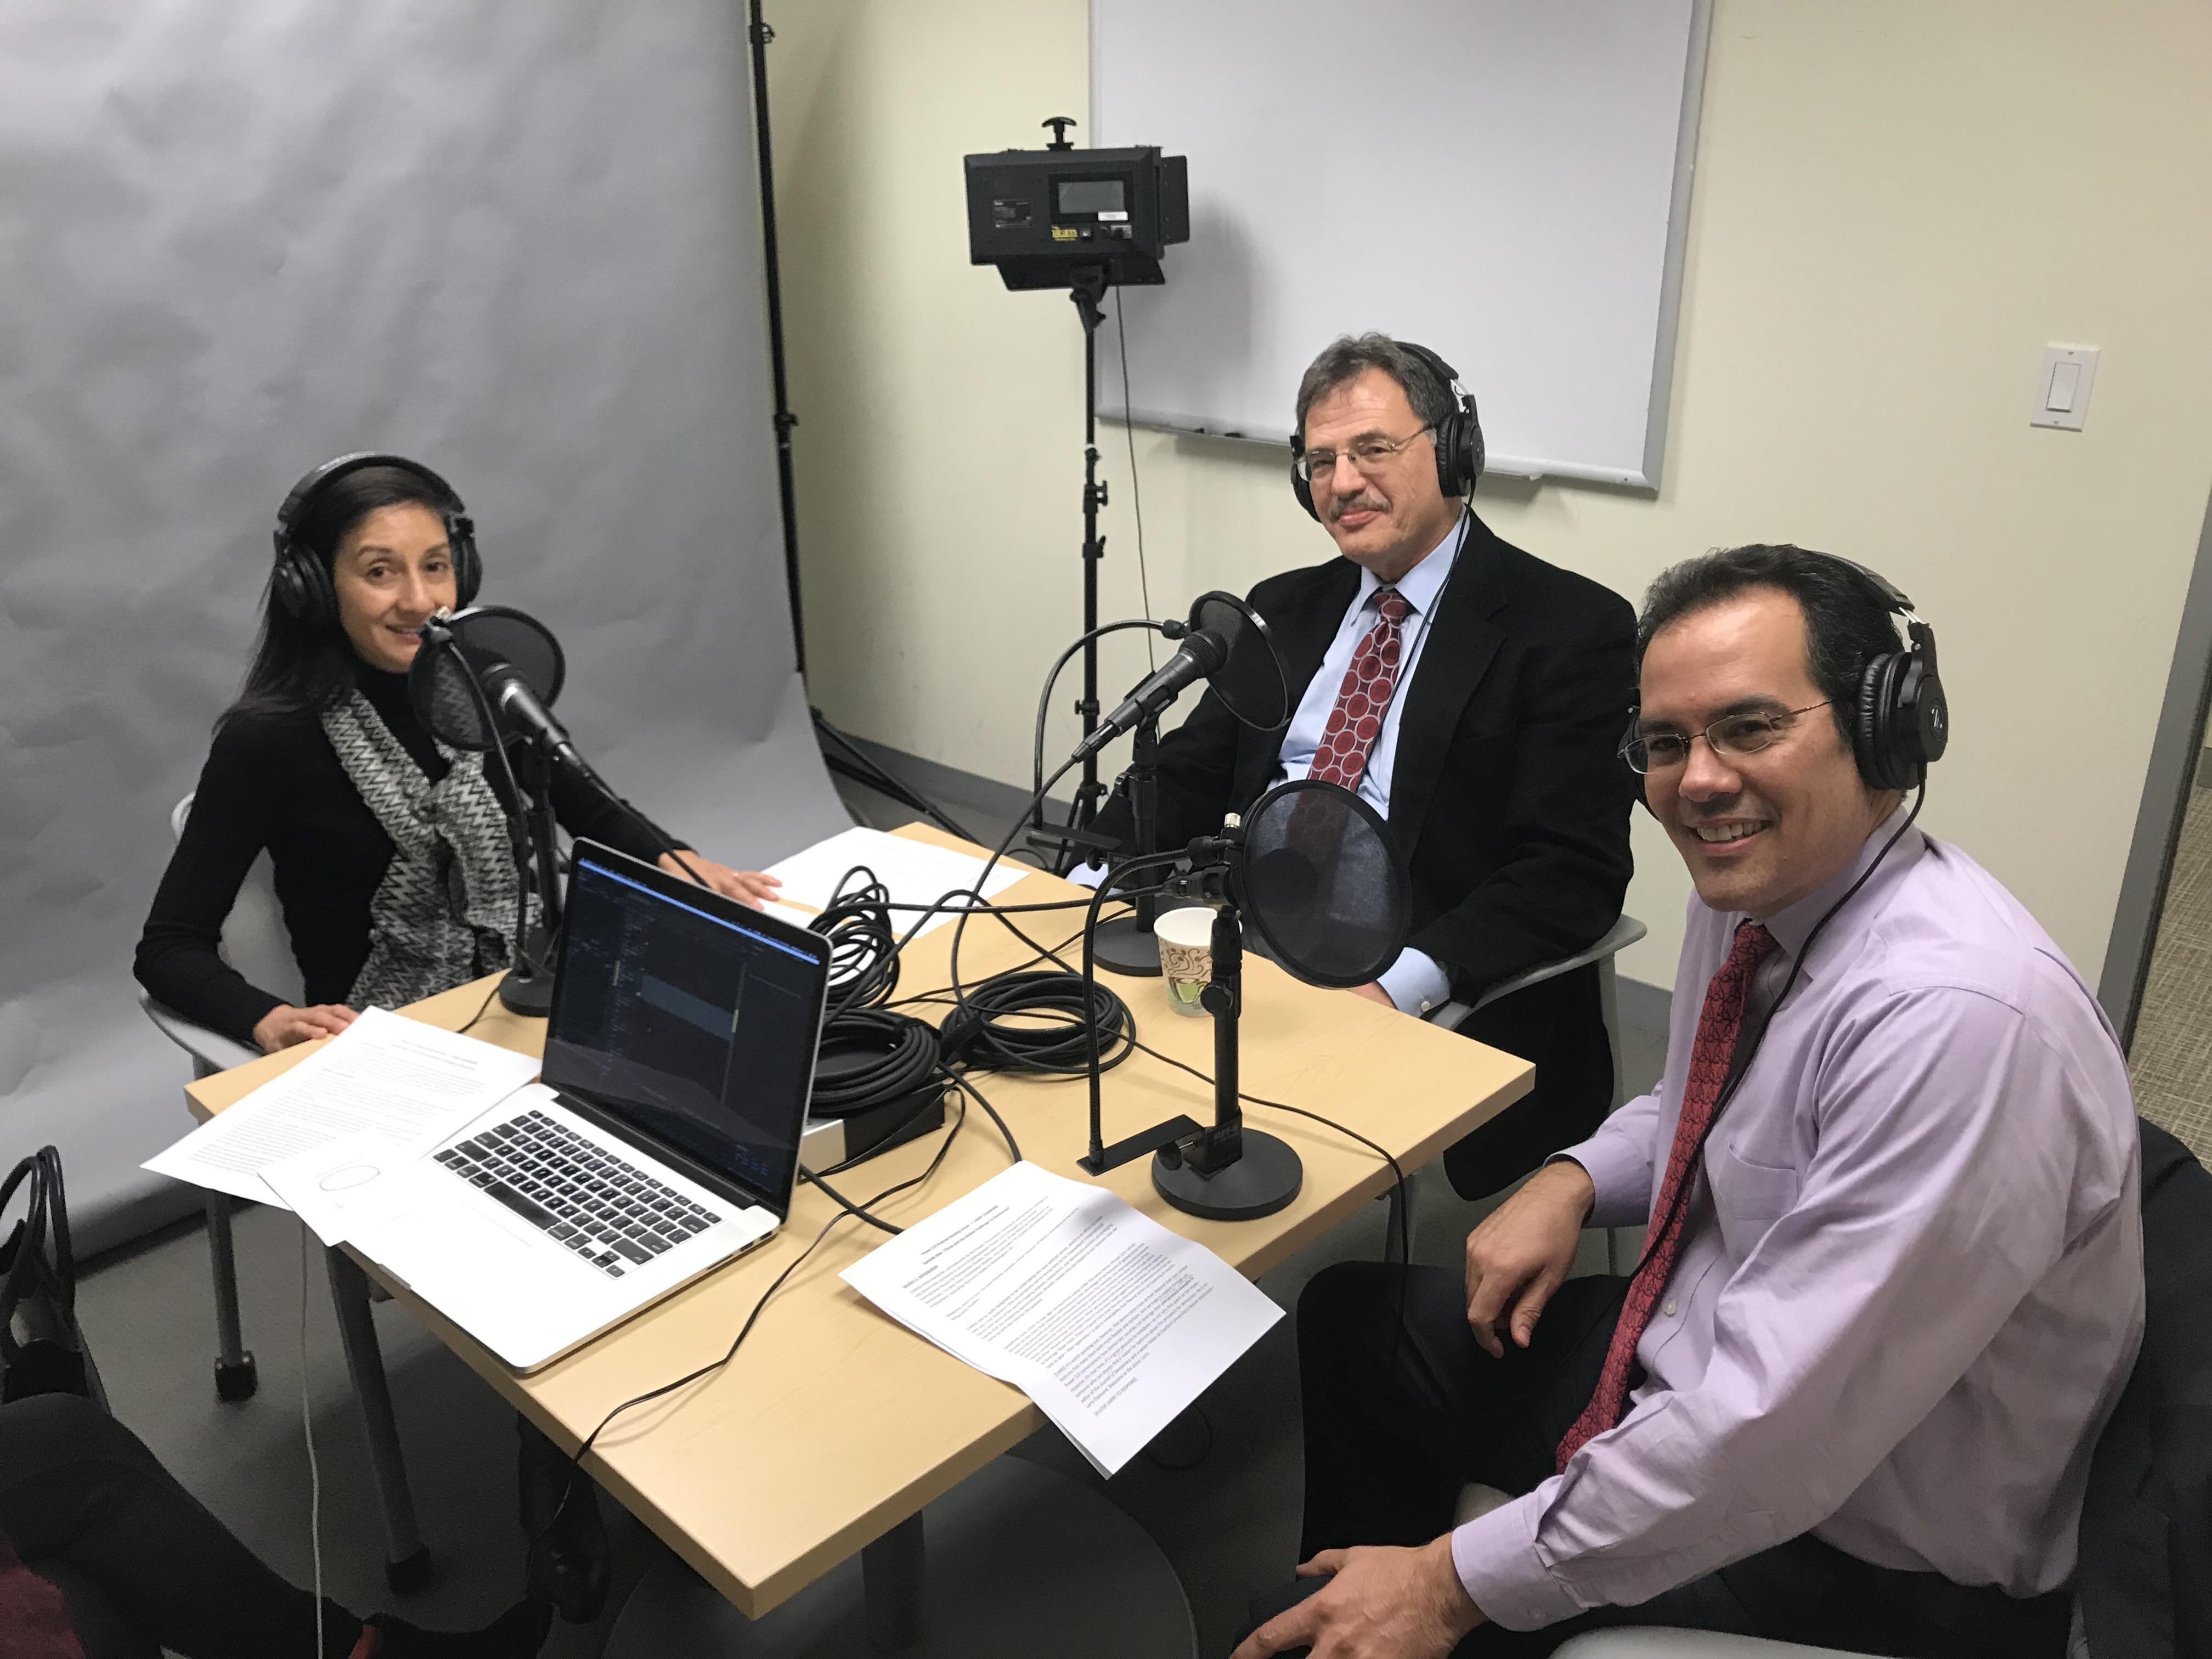 Power 3 0 Podcast   Authoritarian Resurgence, Democratic